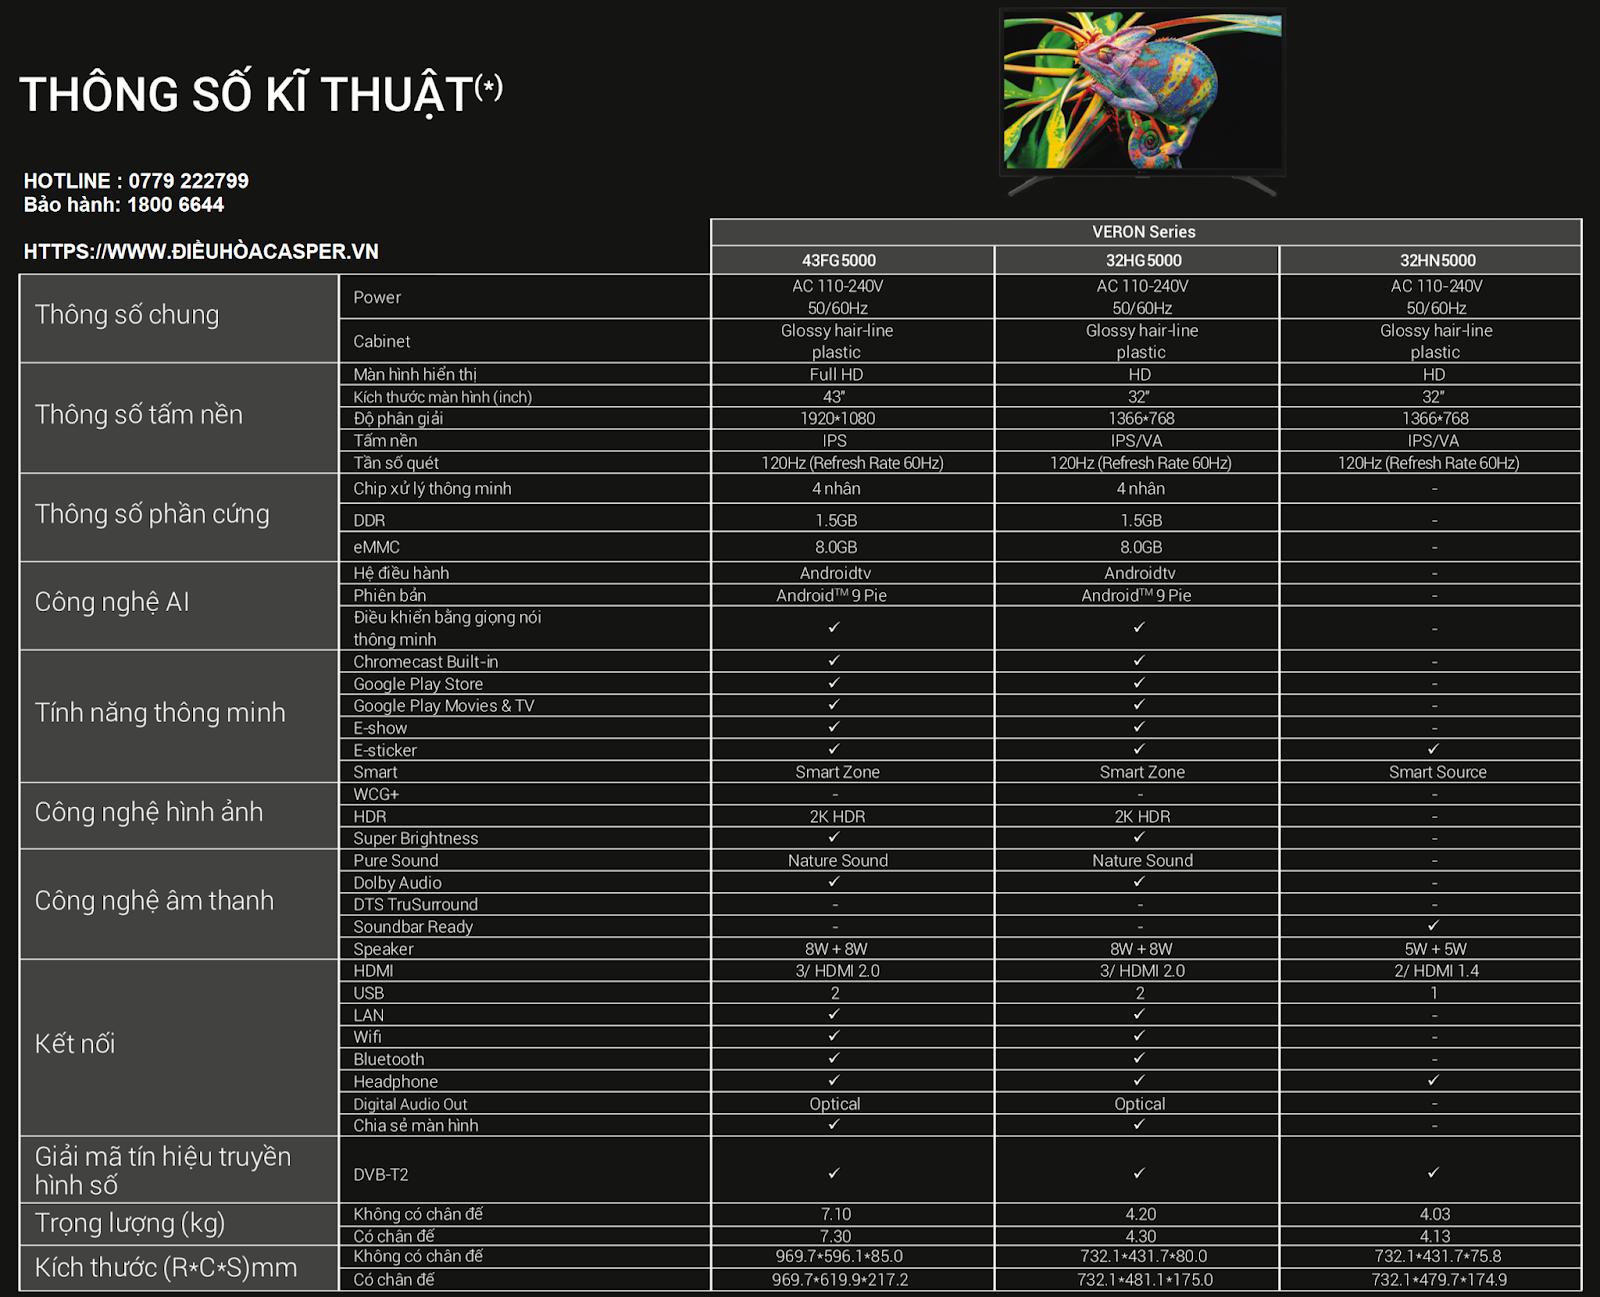 THÔNG SỐ KỸ THUẬT TIVI CASPER 43 INCH 43FG5000 / 5100